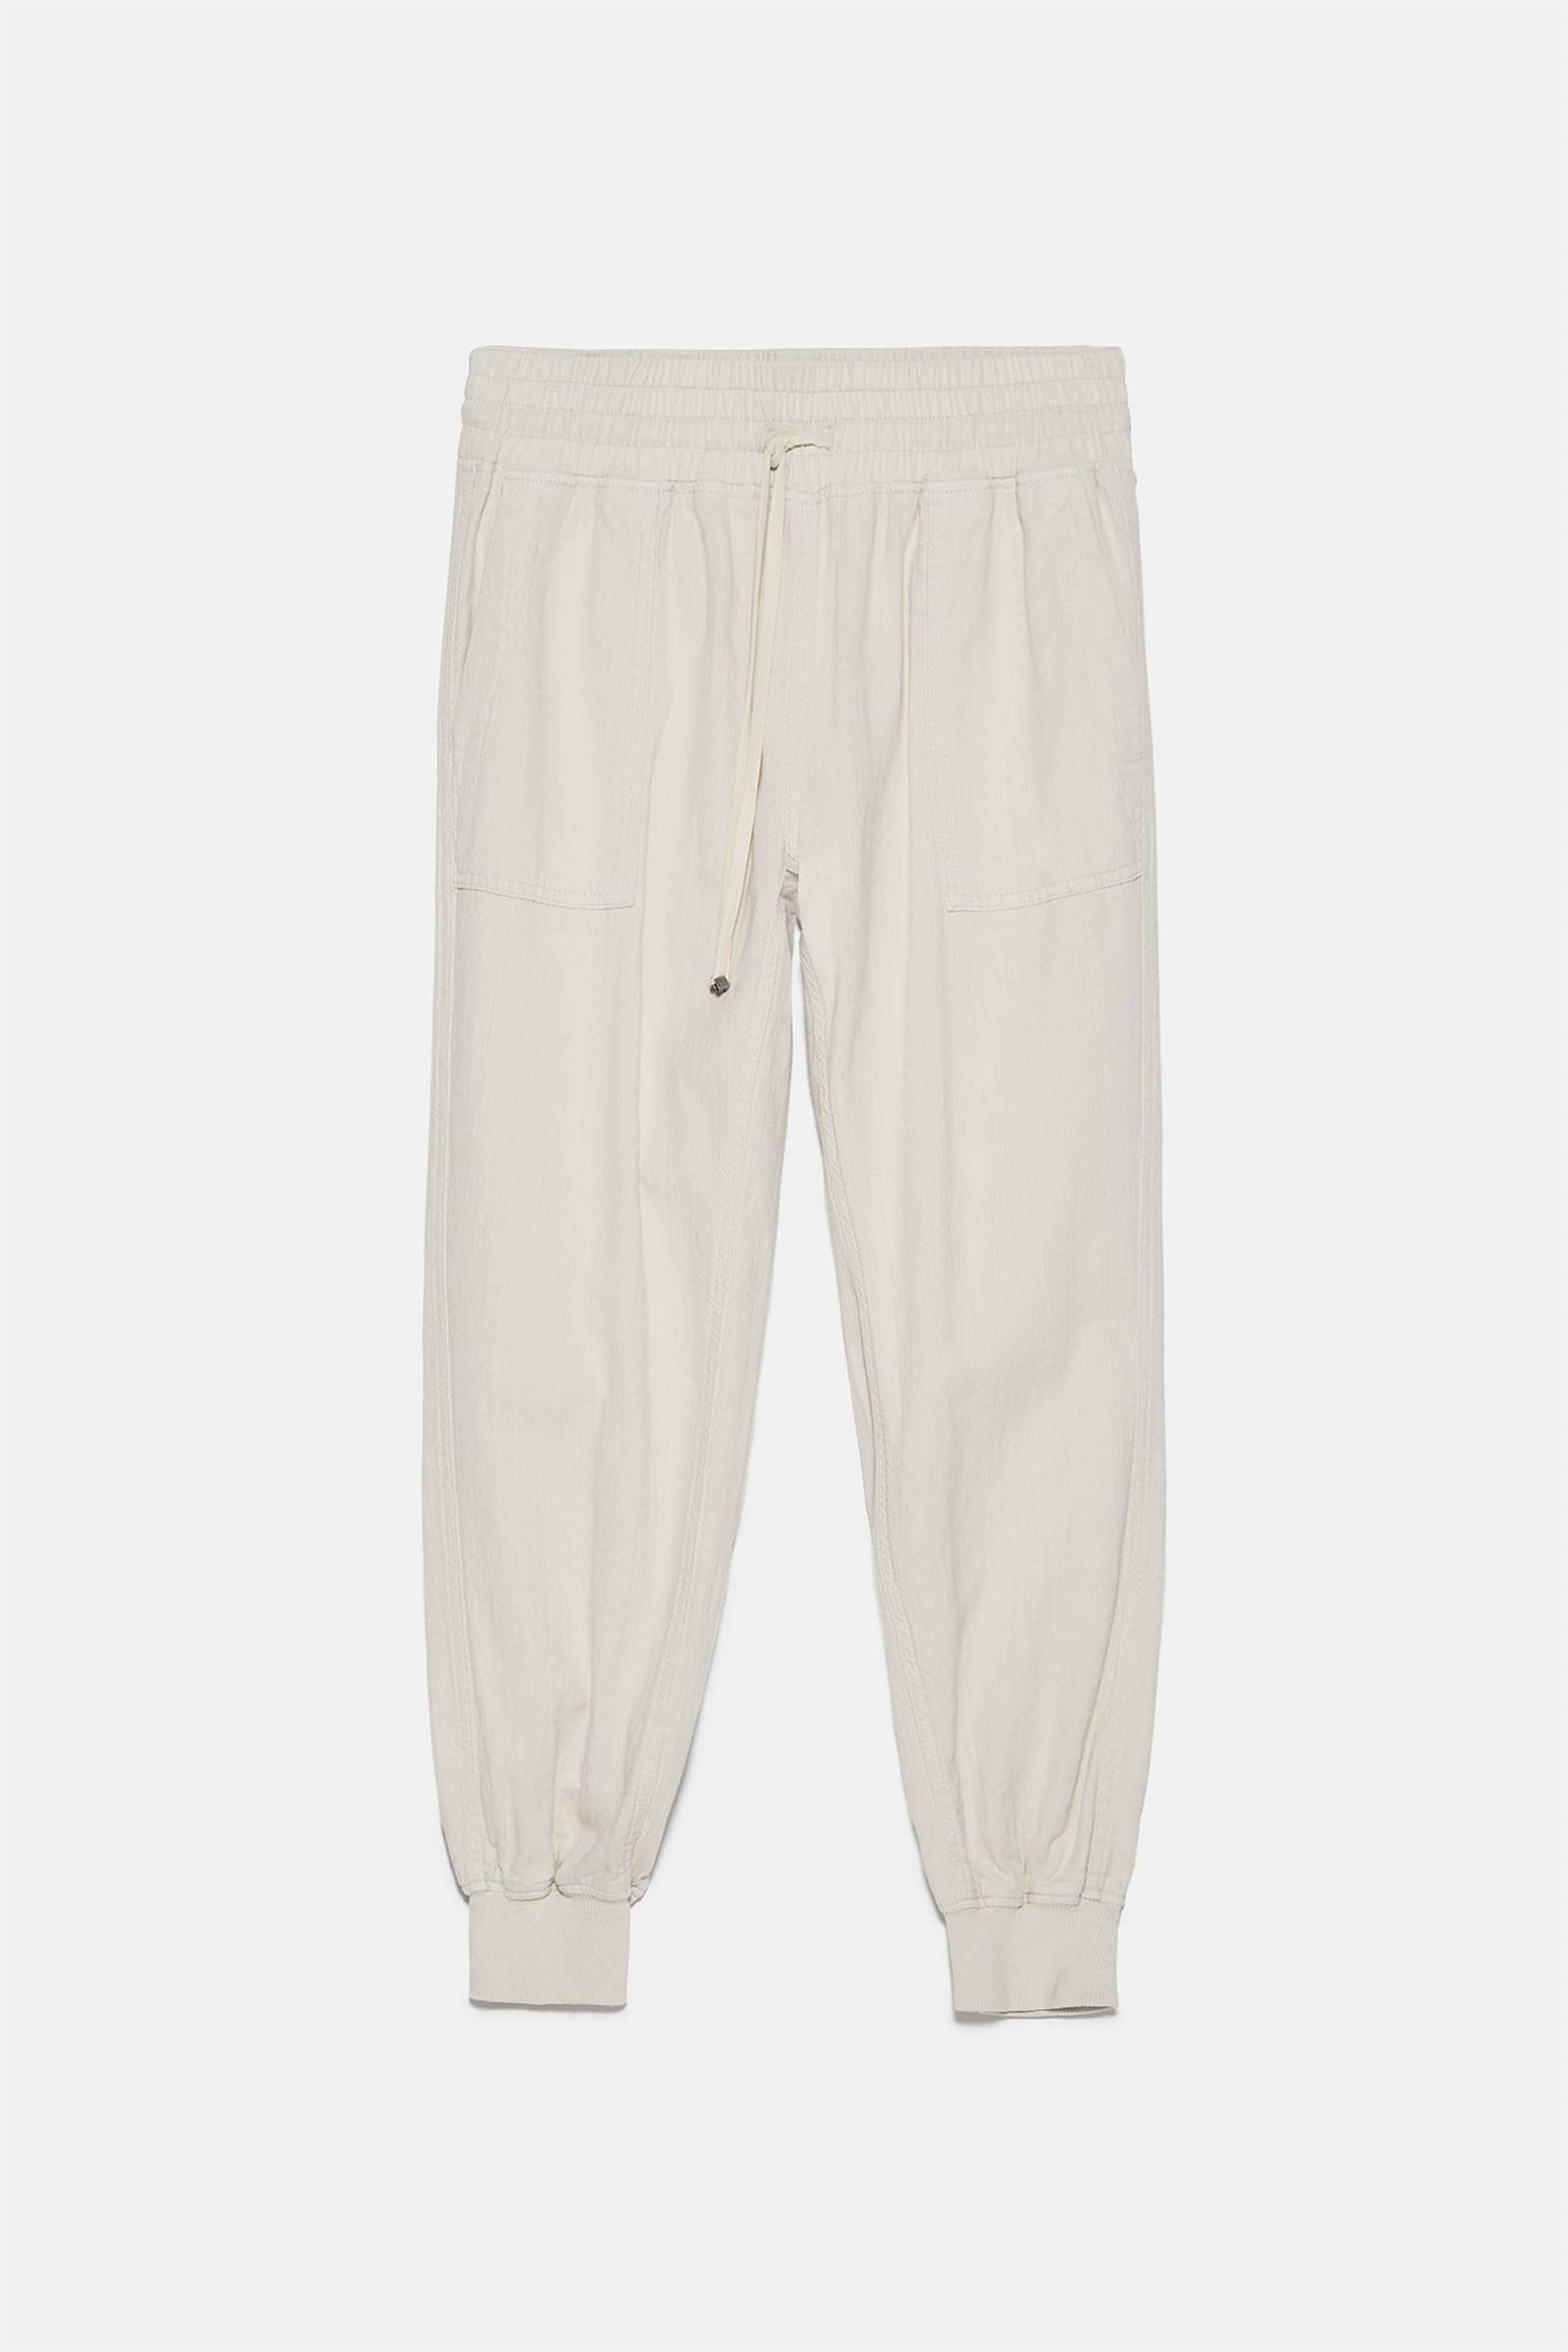 Bershka, Asos, Springfield, Zara... Pantalones cero ...